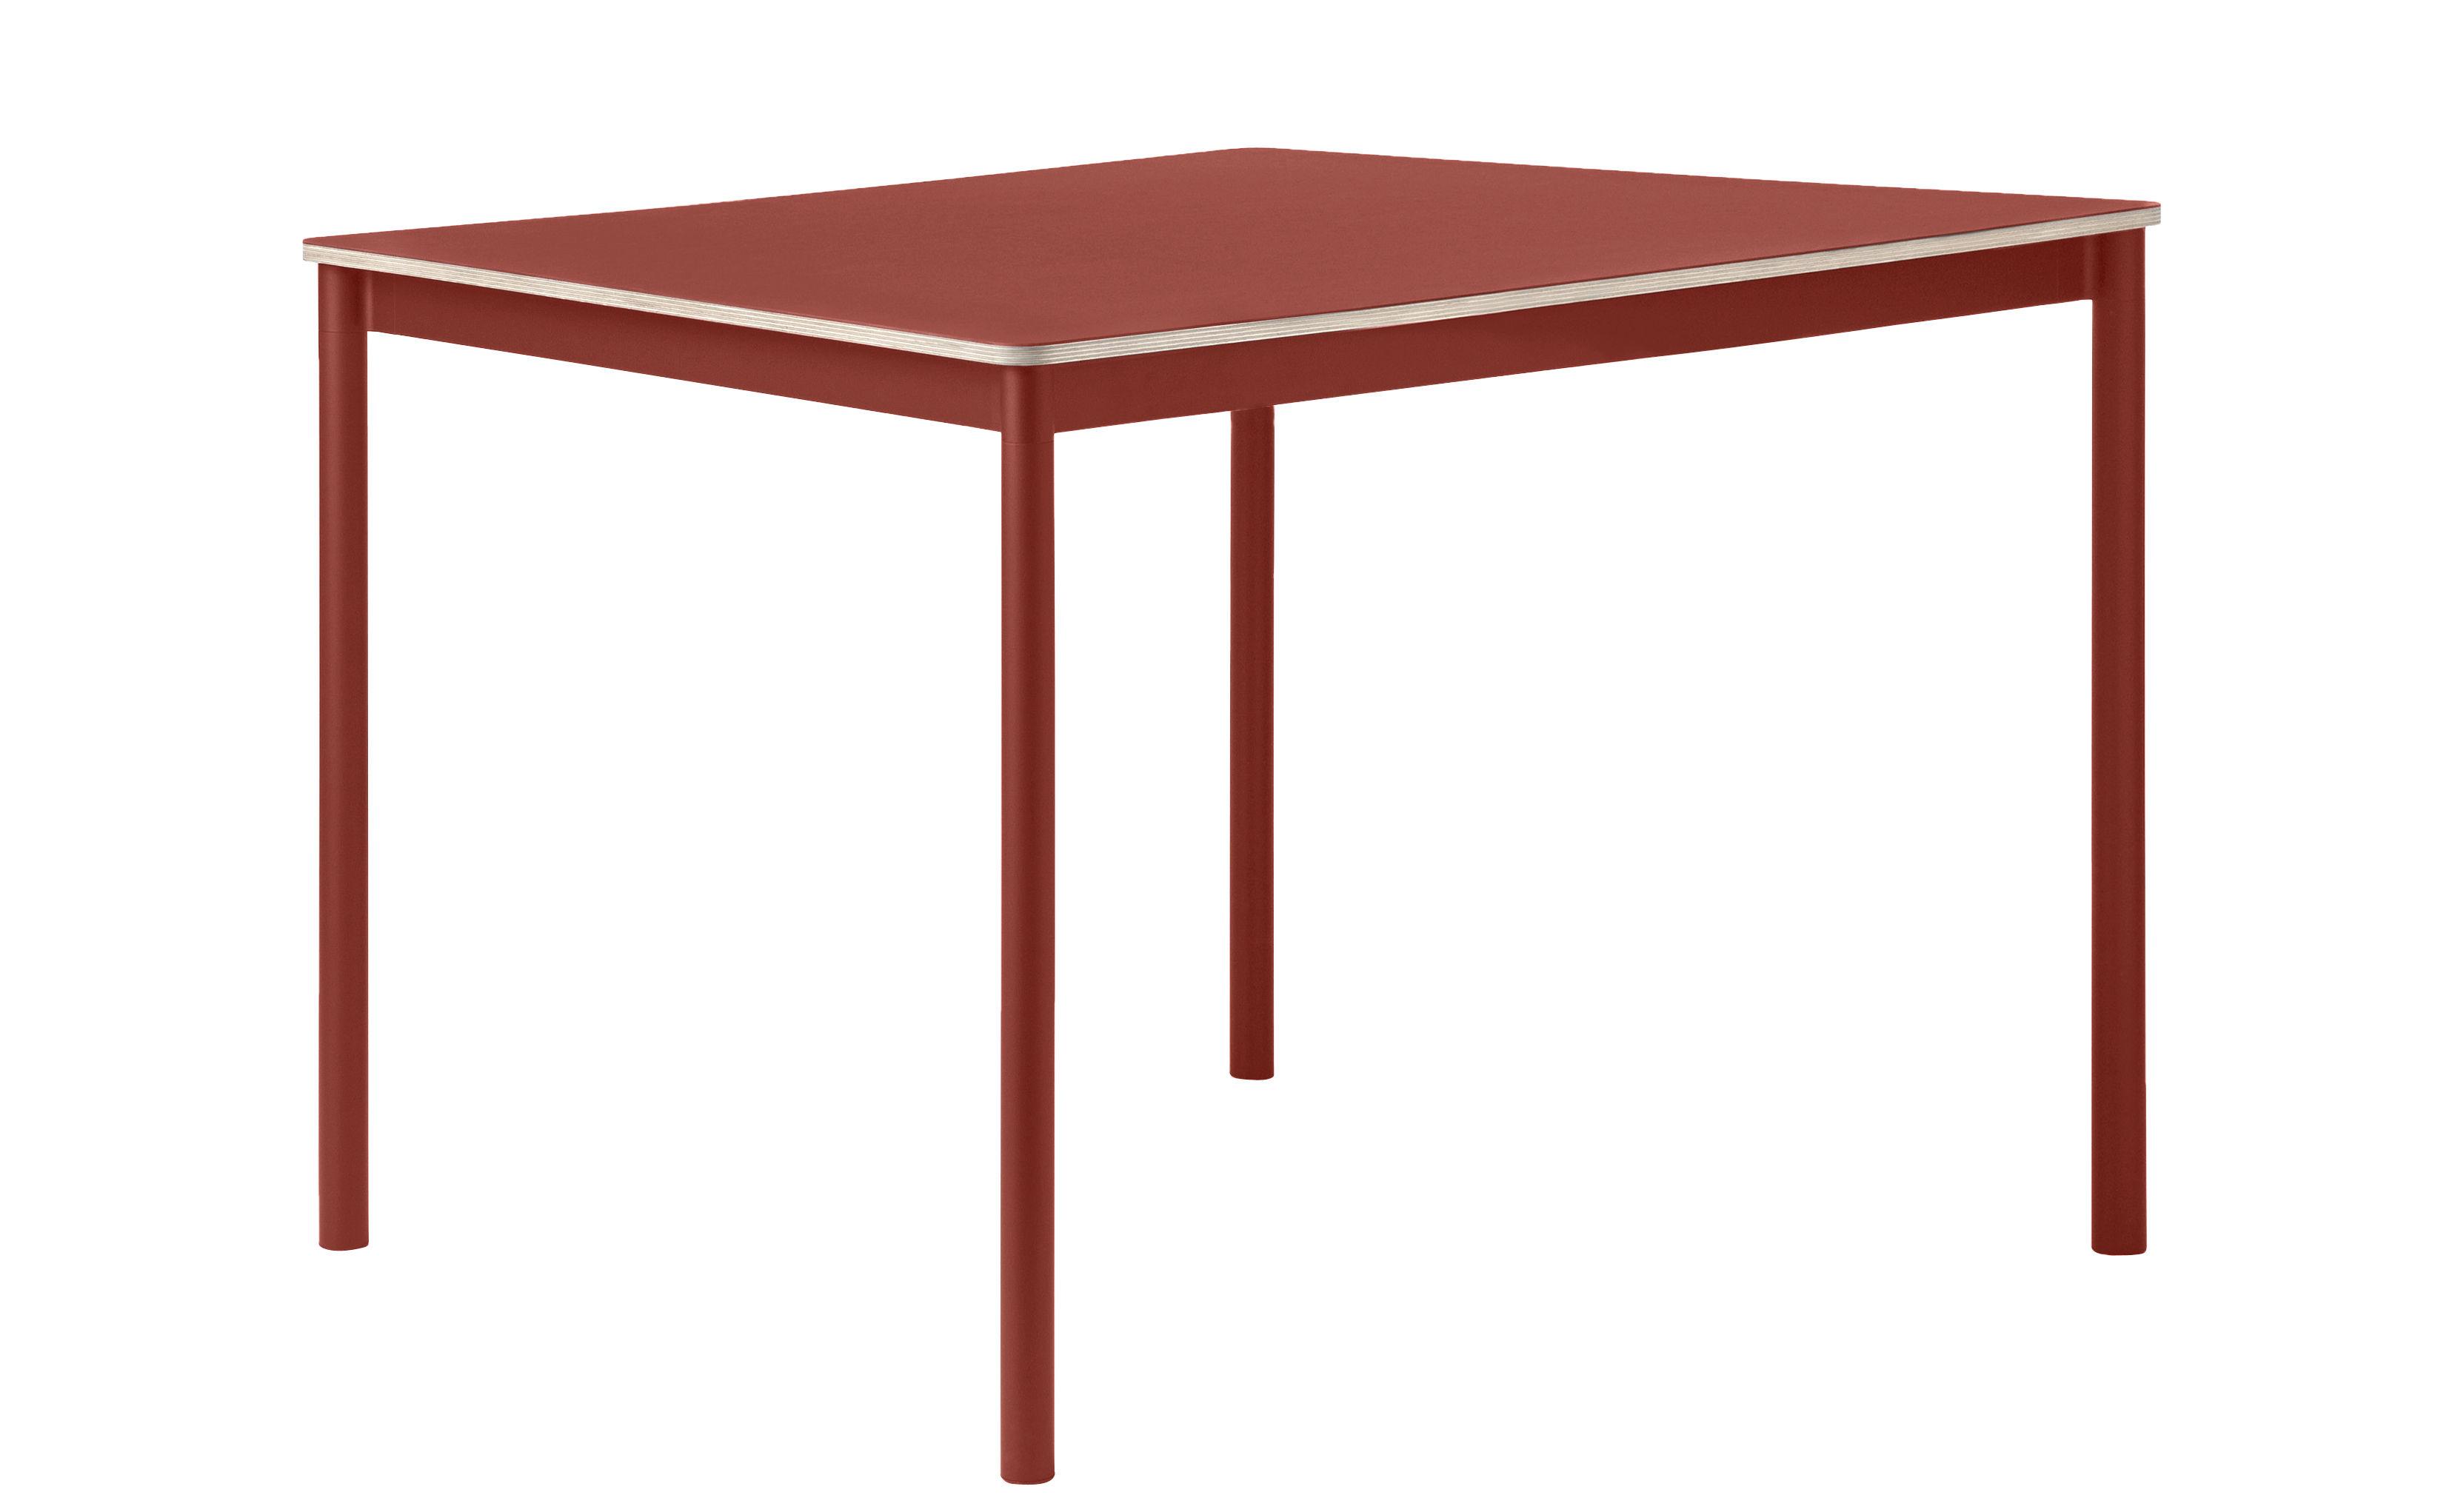 Table base plateau bois 140 x 80 cm rouge sombre muuto for Table 140 x 80 design